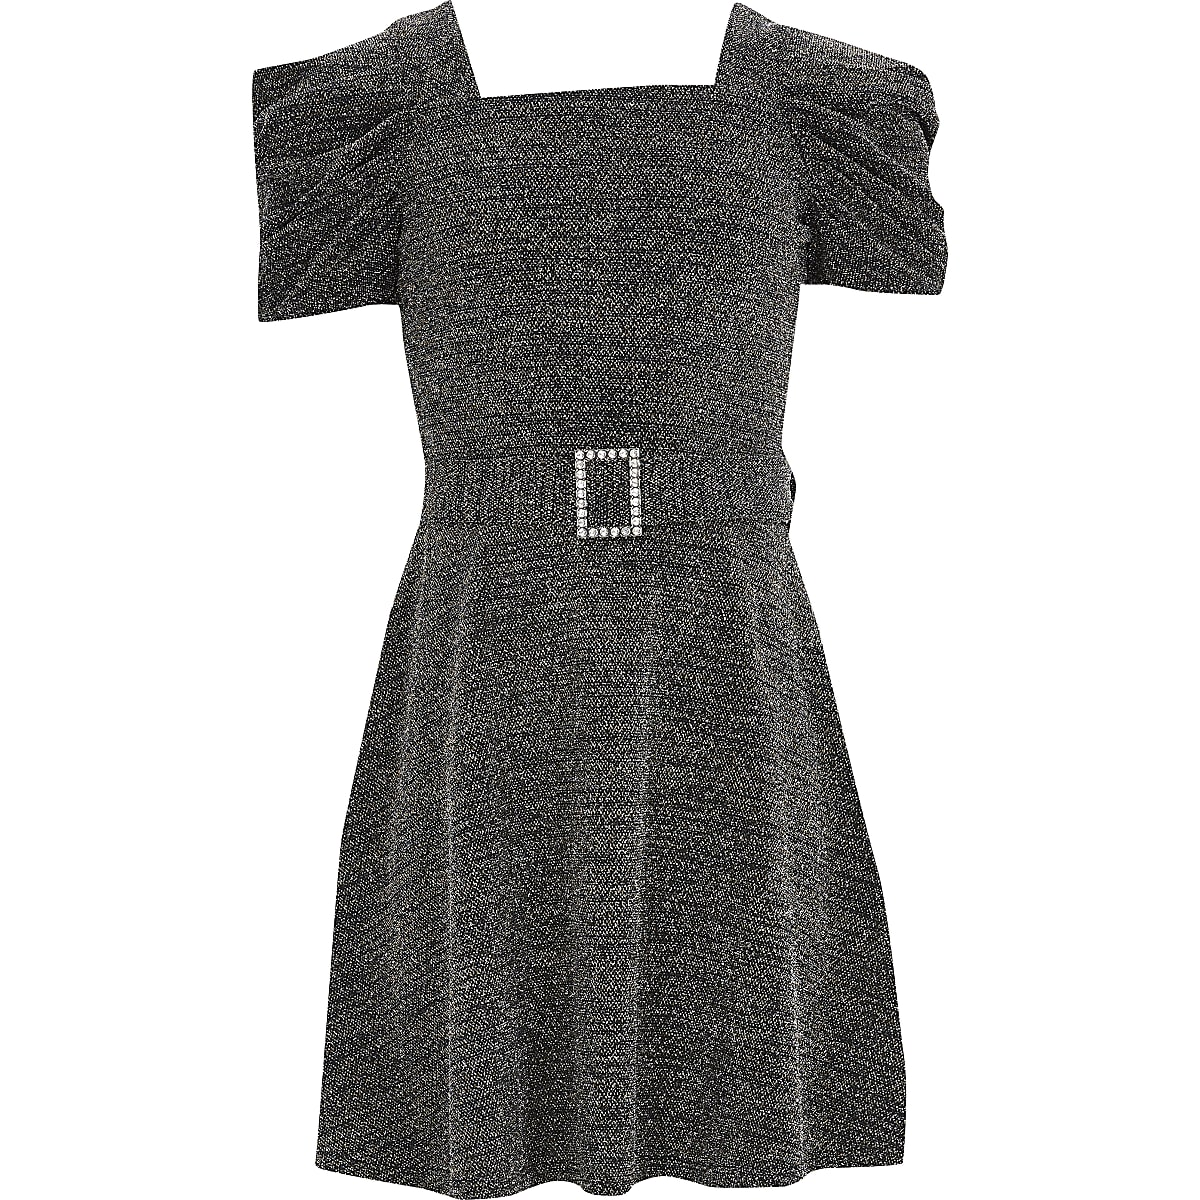 Girls black sparkle puff sleeve skater dress